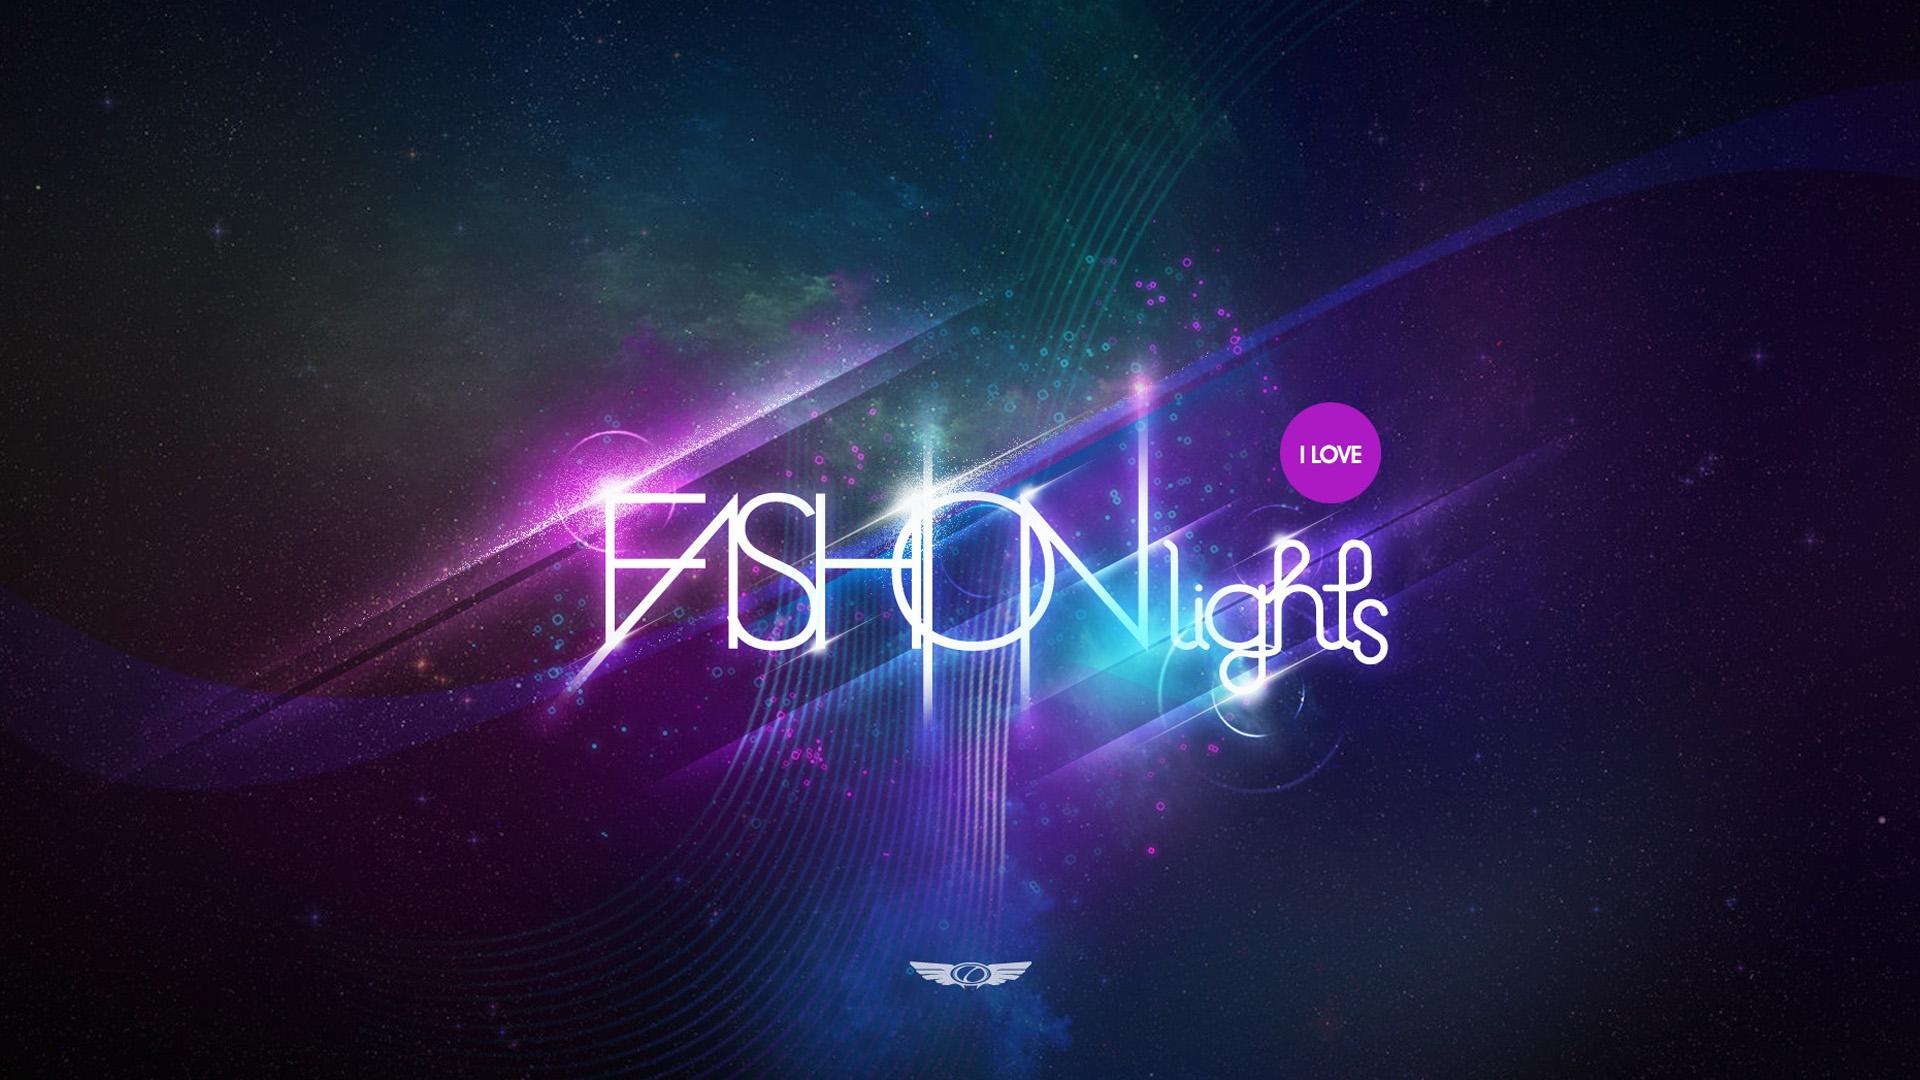 Pin Fashion Neon Lights Wallpaper 1920x1080 1920x1080